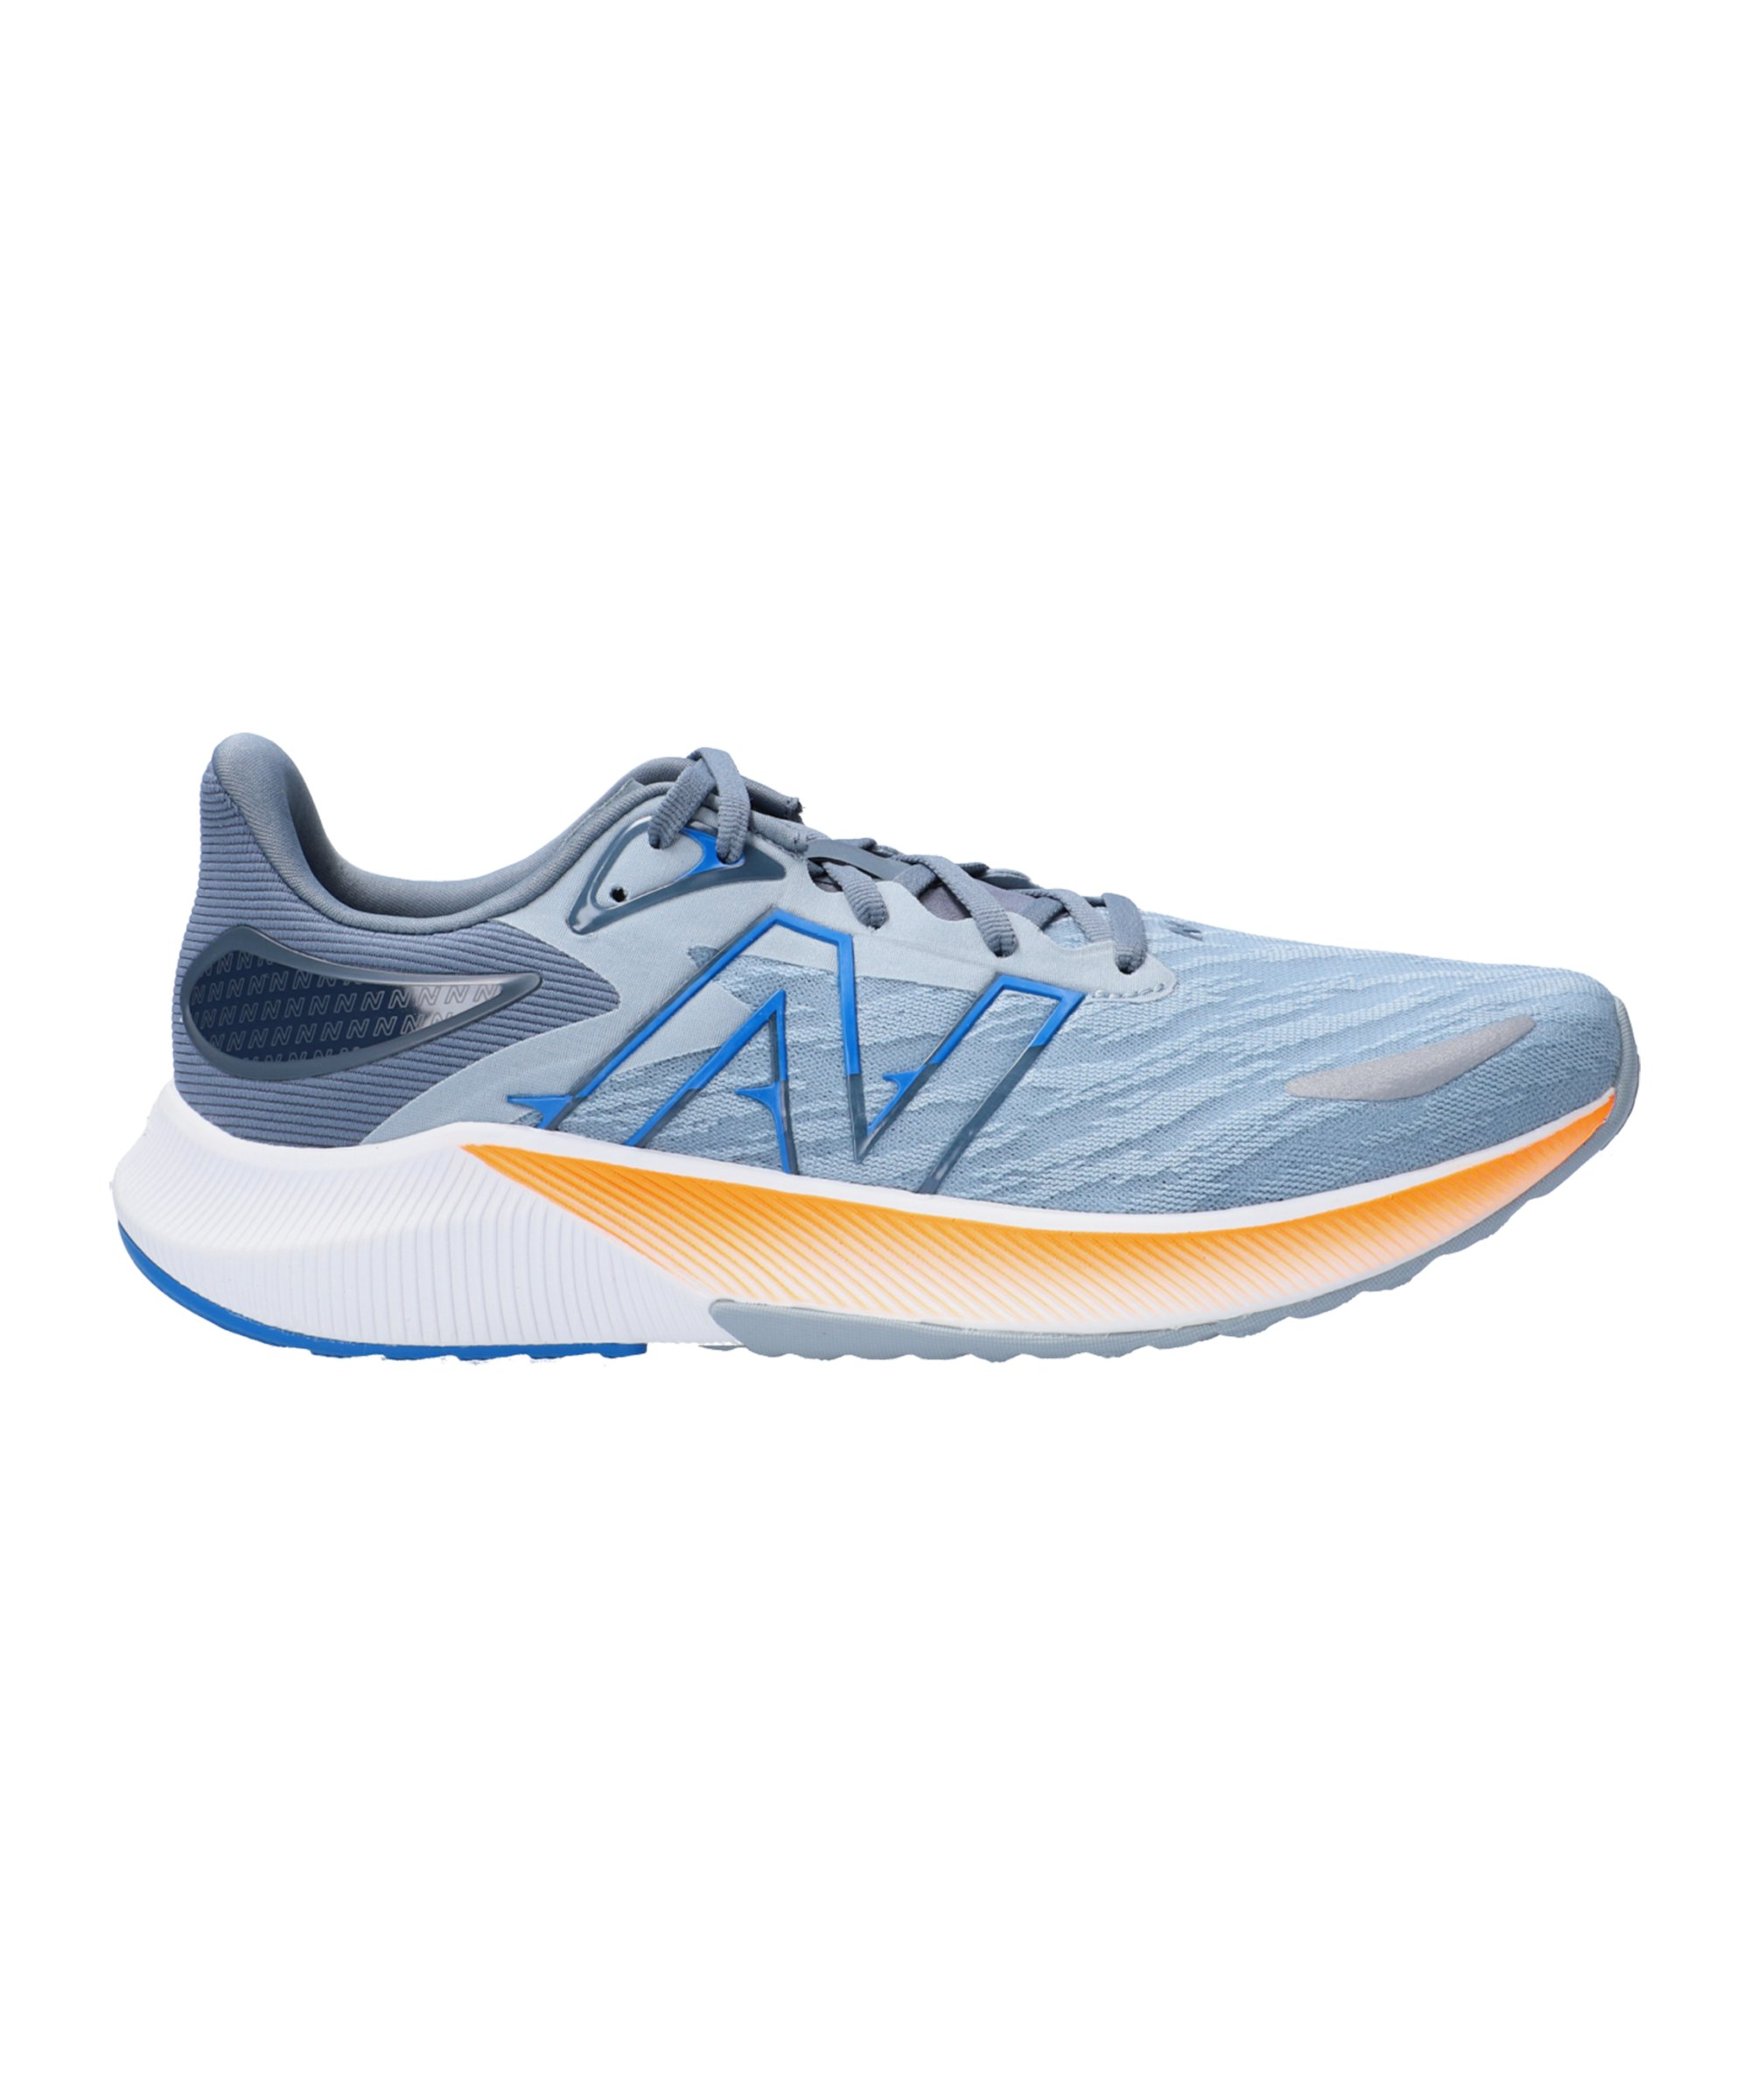 New Balance MFCPRLG3 Running Blau FLG3 - blau